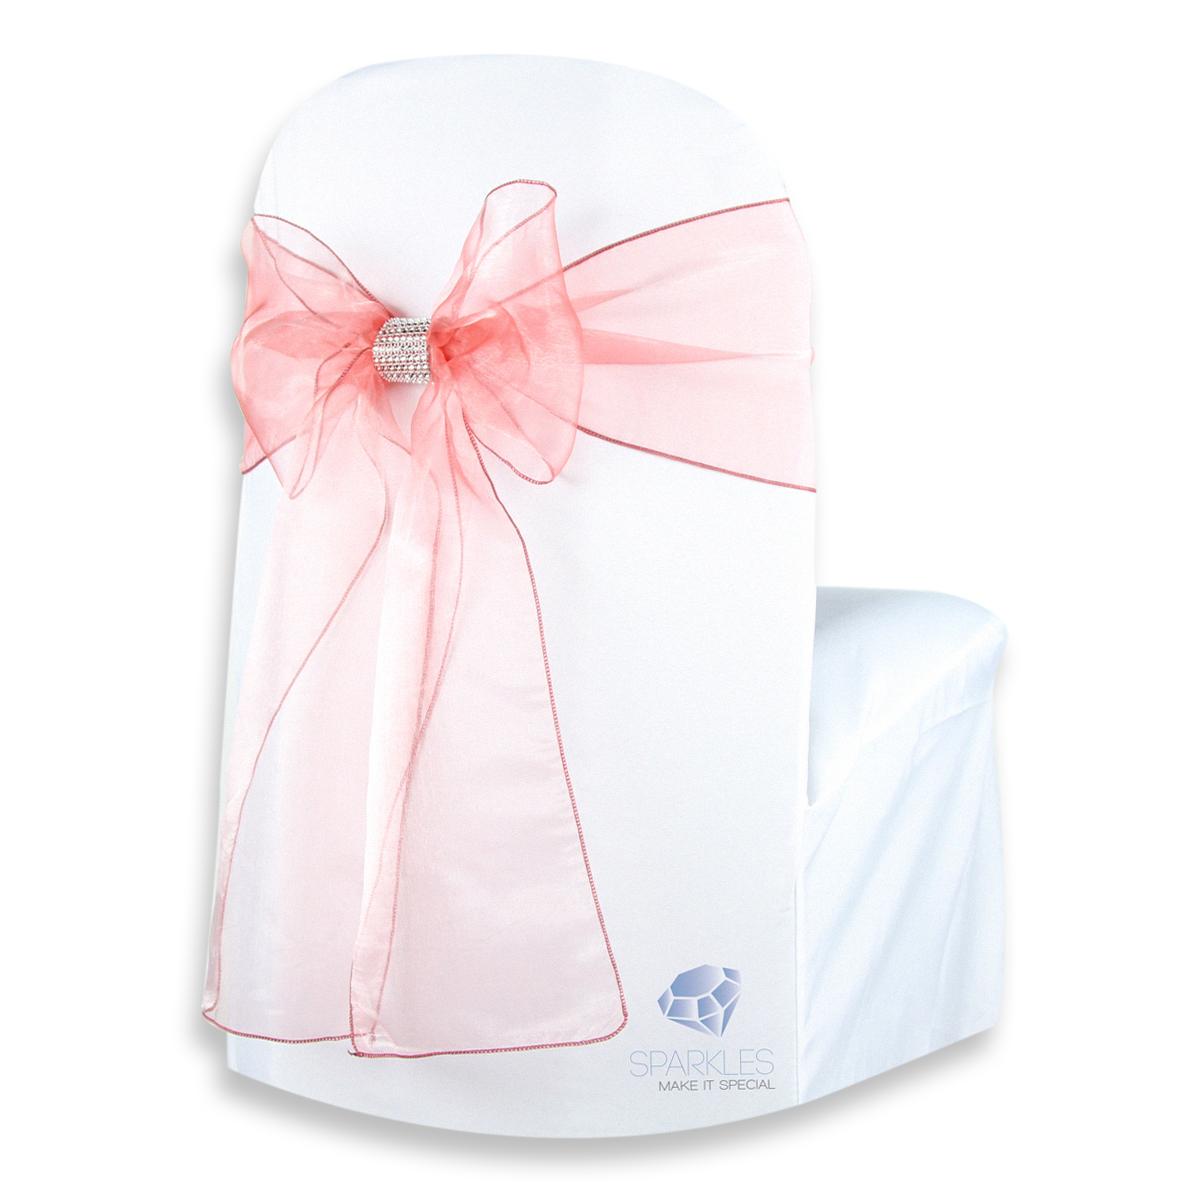 100 Pcs Organza Chair Cover Bow Sash 108x8 Wedding Party Banquet Reception